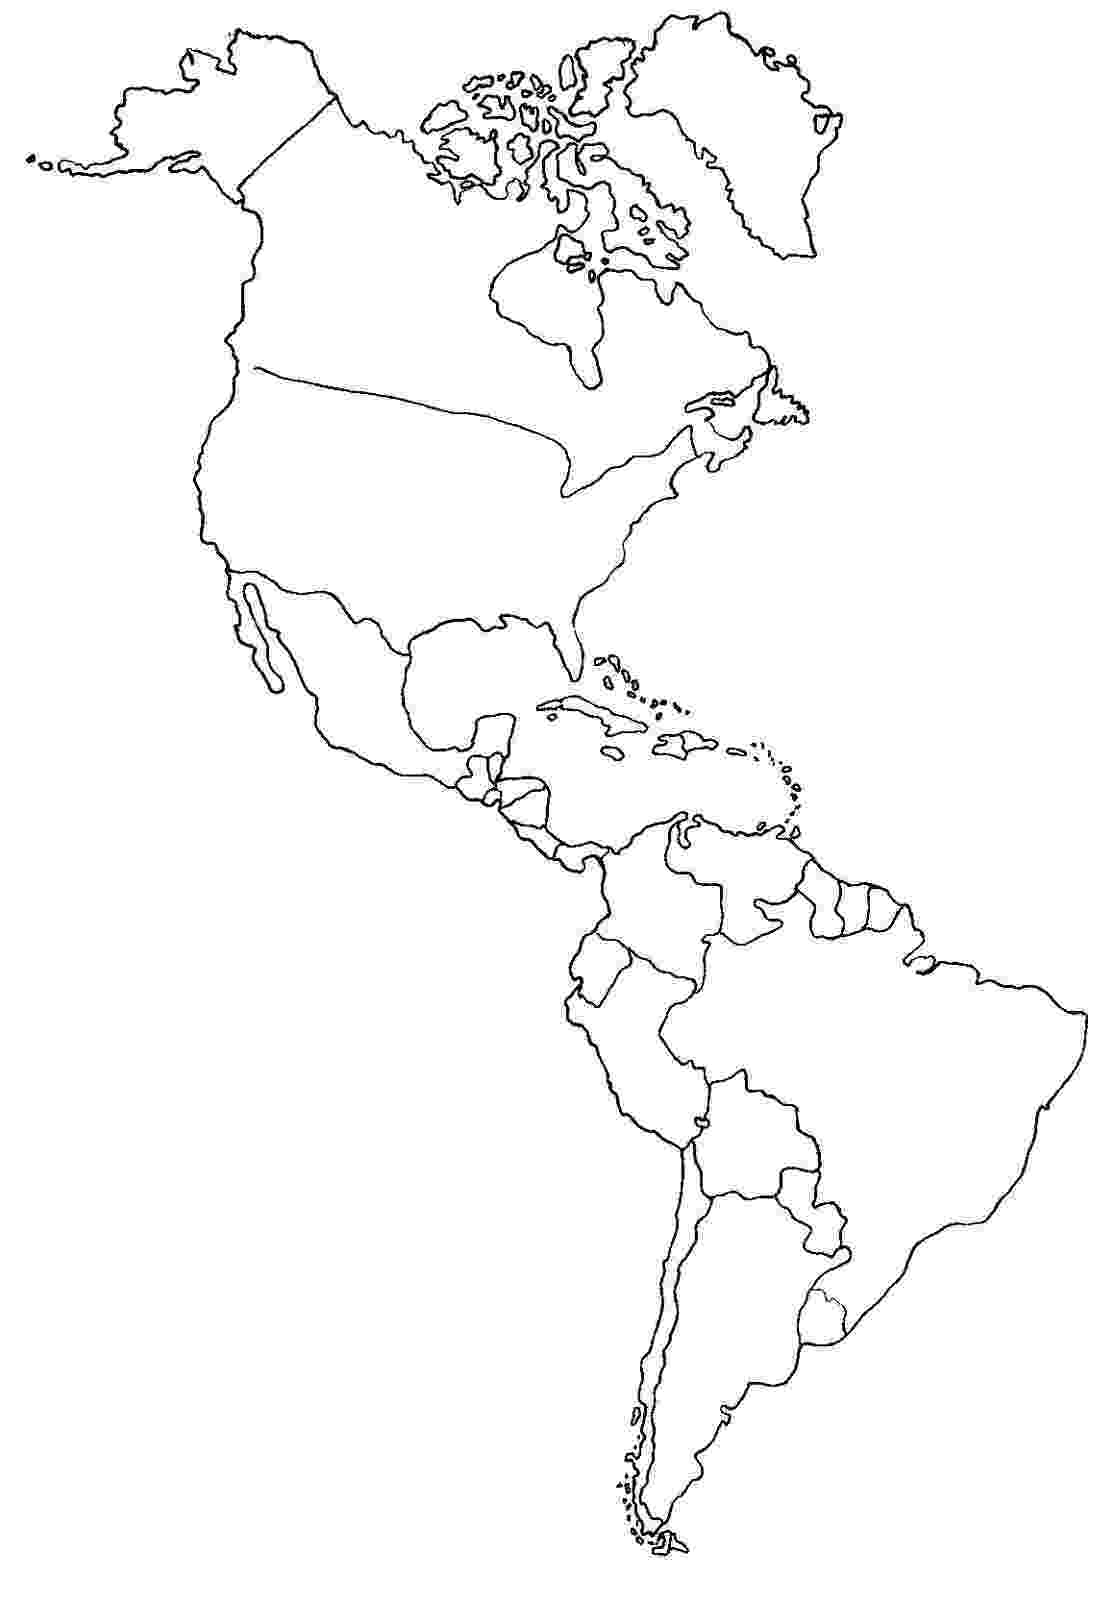 mapa de centroamerica colorear mapa de centroamérica y méxico mapas mapa de centroamerica